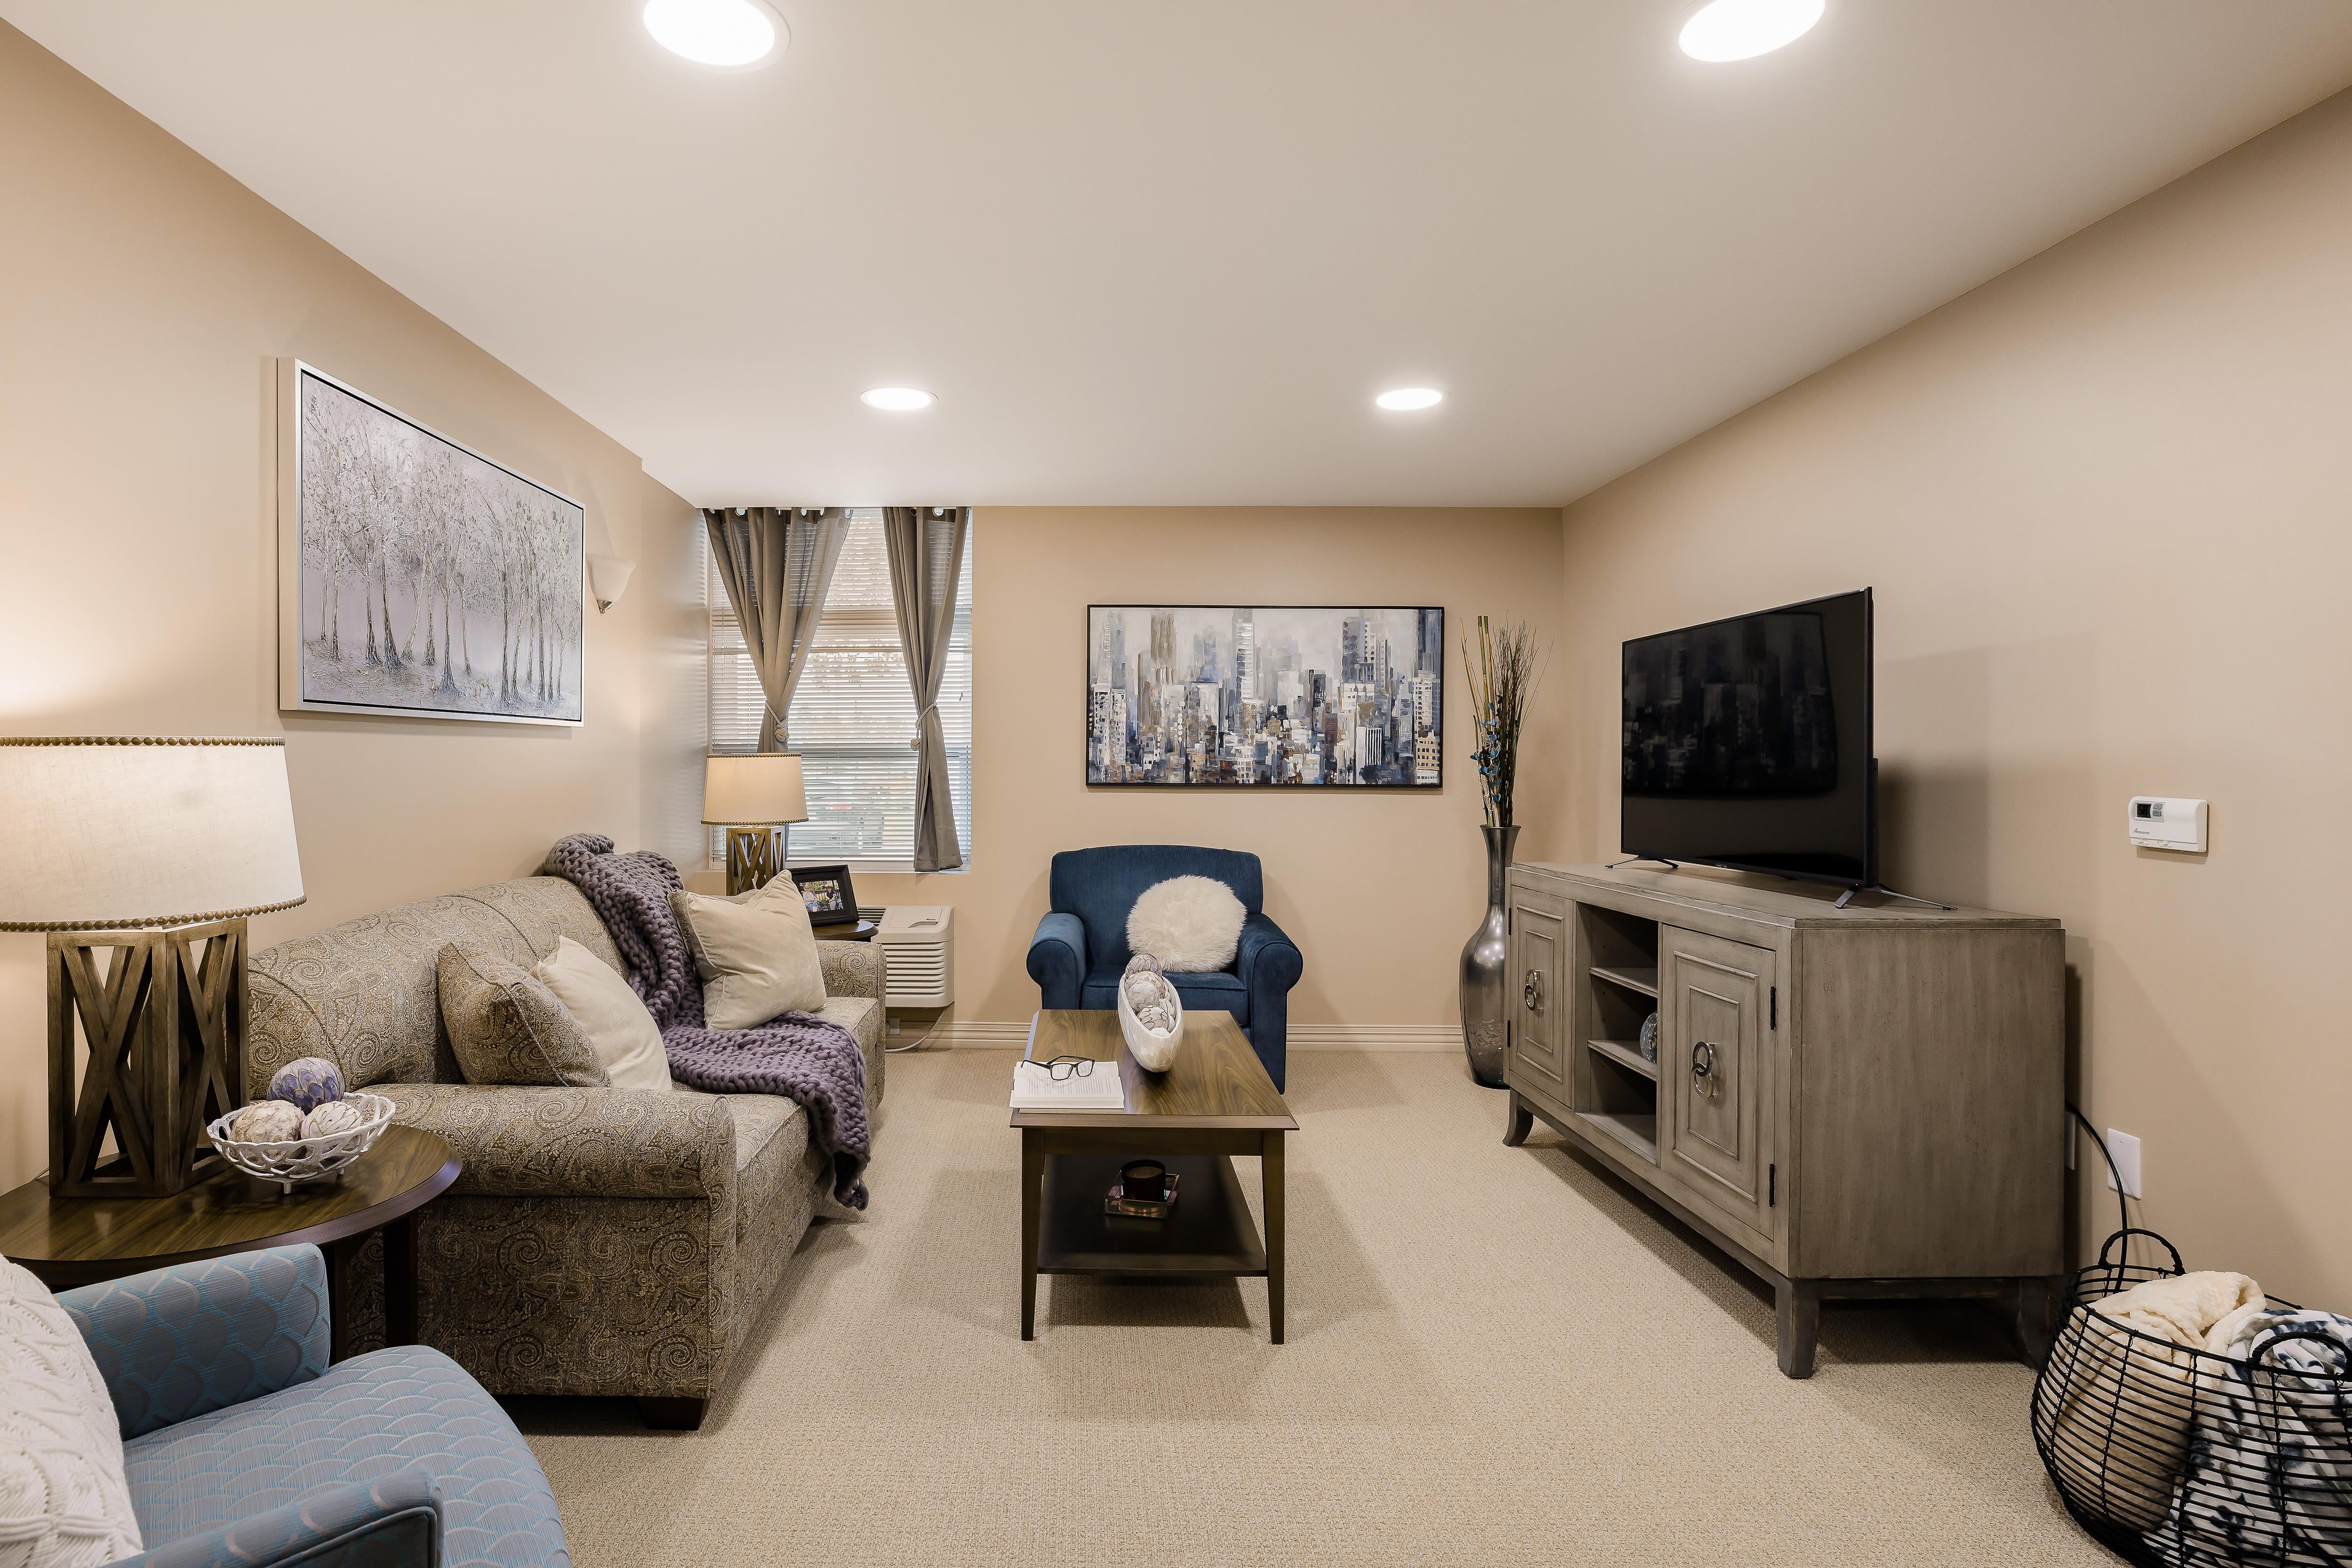 Apartment Anthology of Olathe in Olathe, Kansas